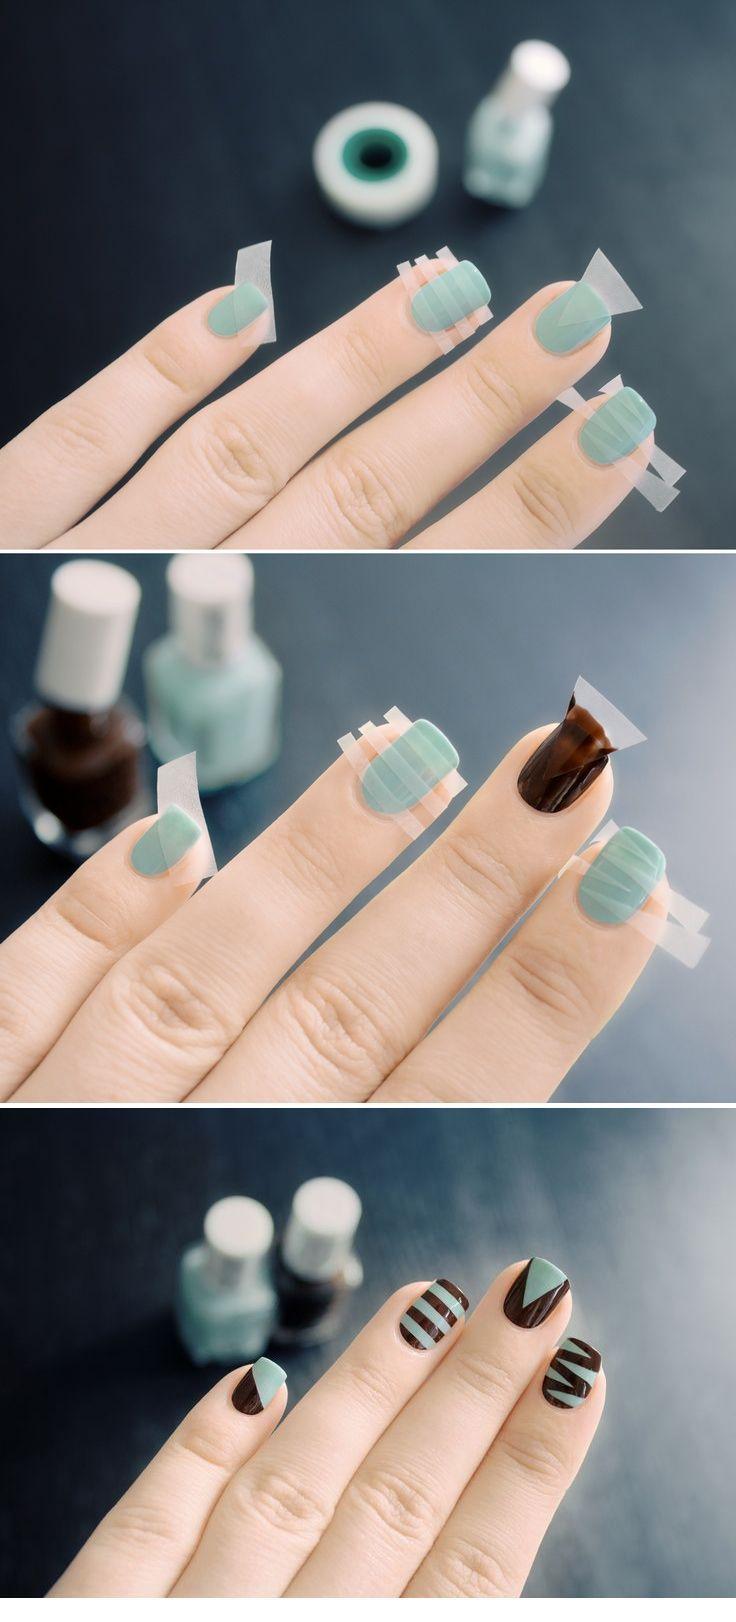 ¿Te animas a hacer esta idea de arte para uñas?